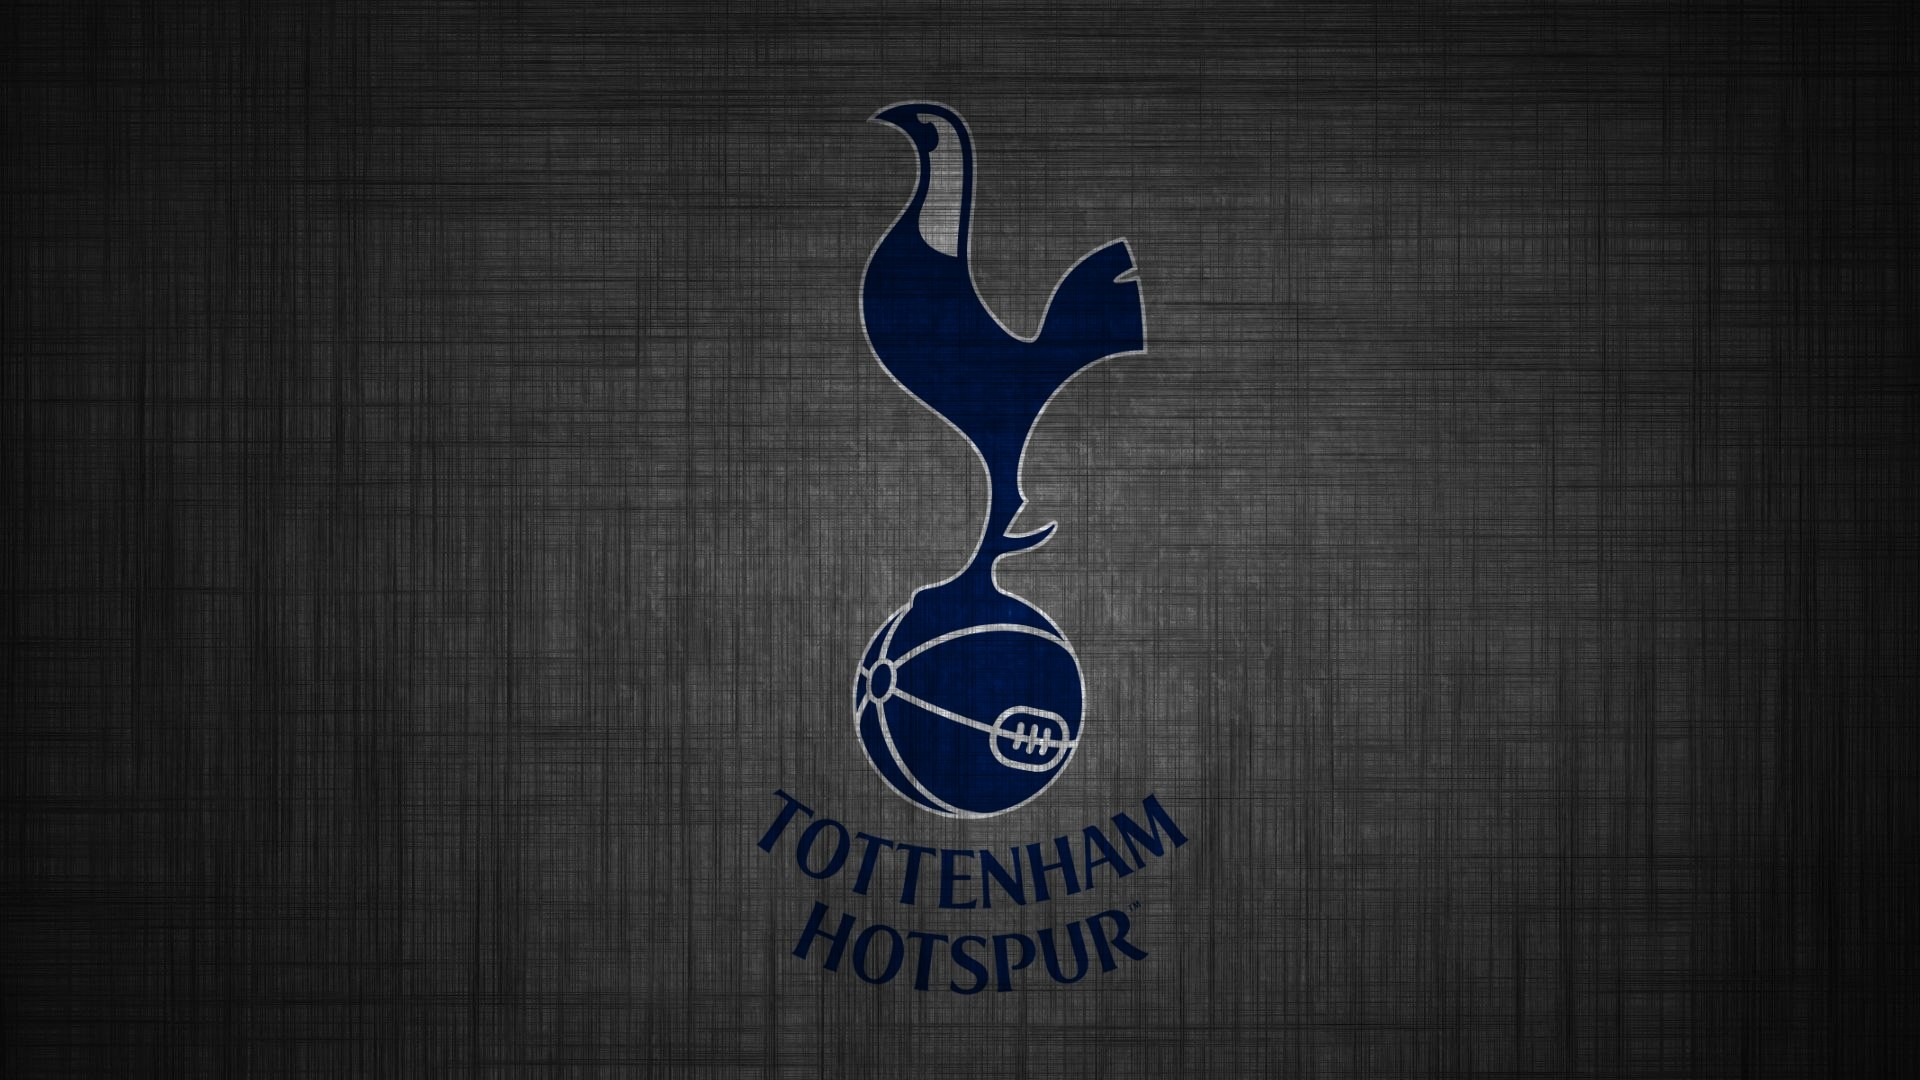 Tottenham Hotspur Wallpapers ·① WallpaperTag